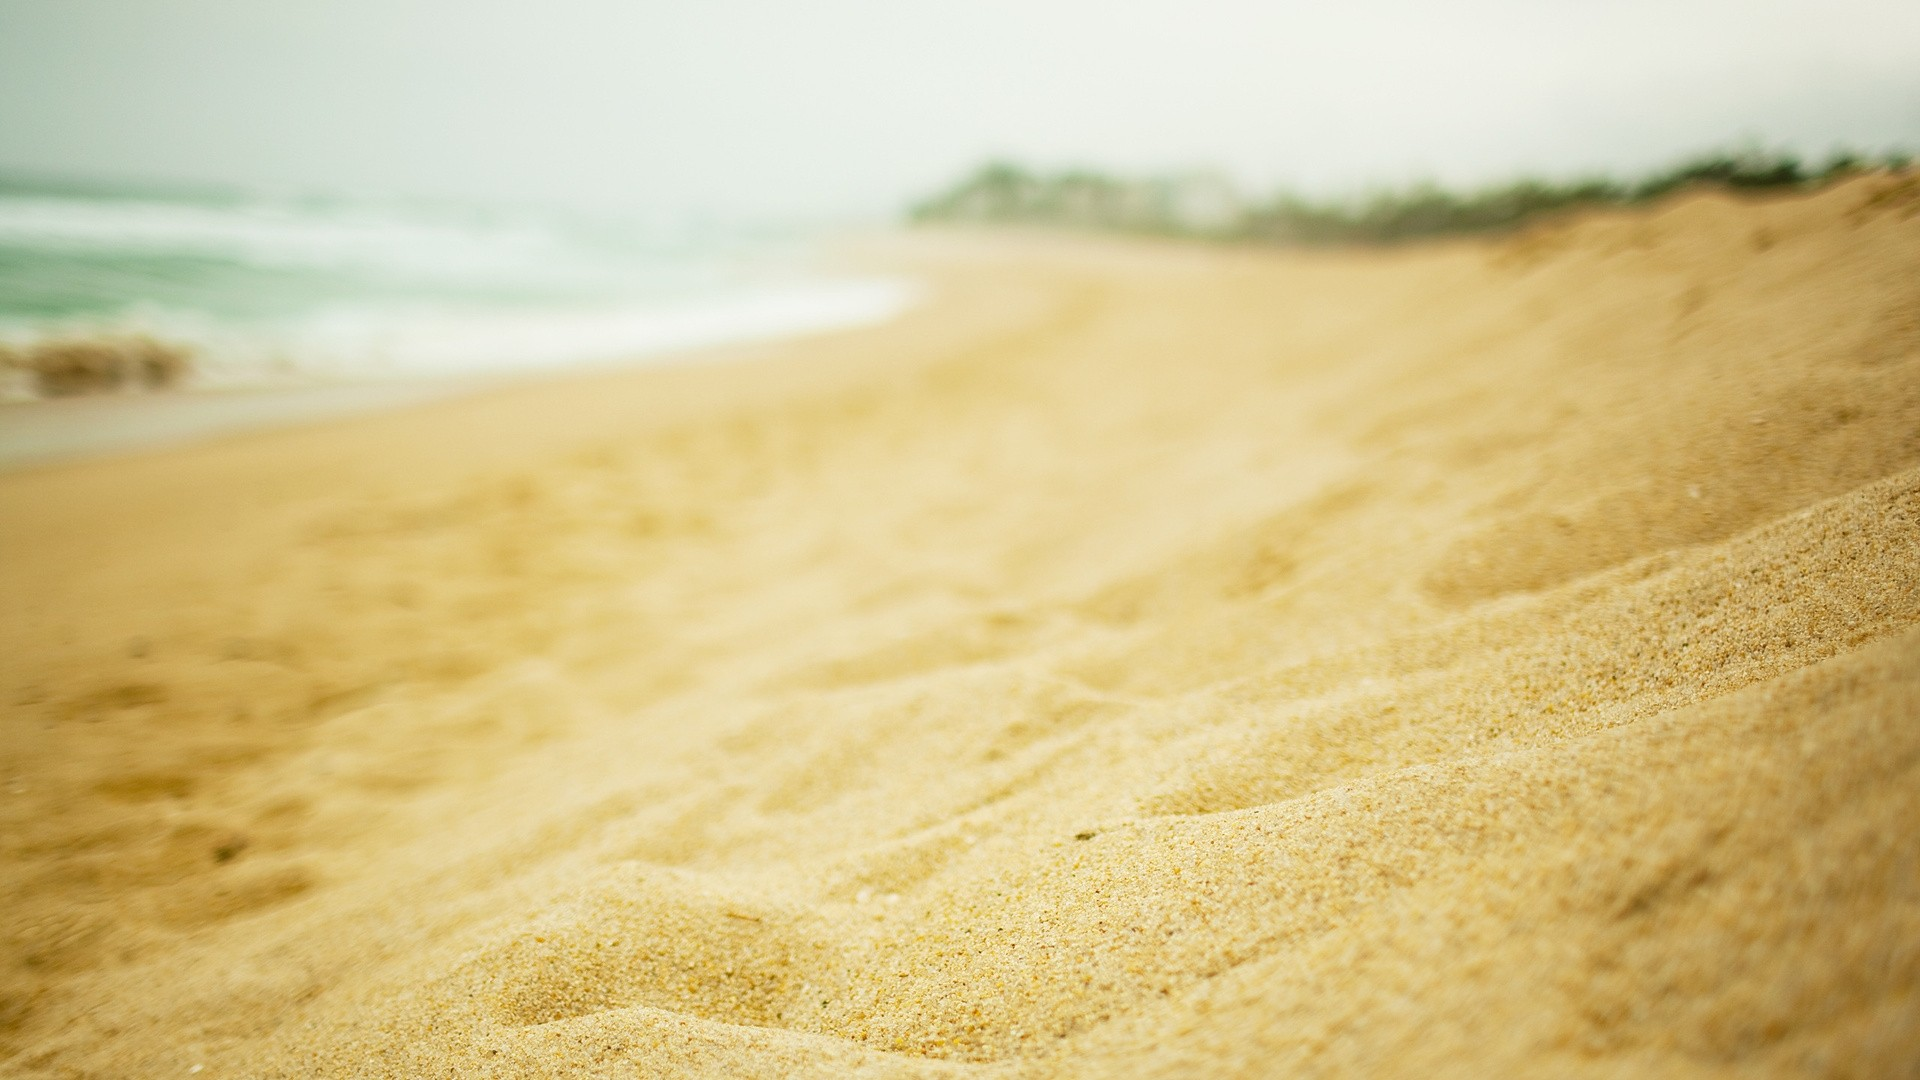 Sand High Quality